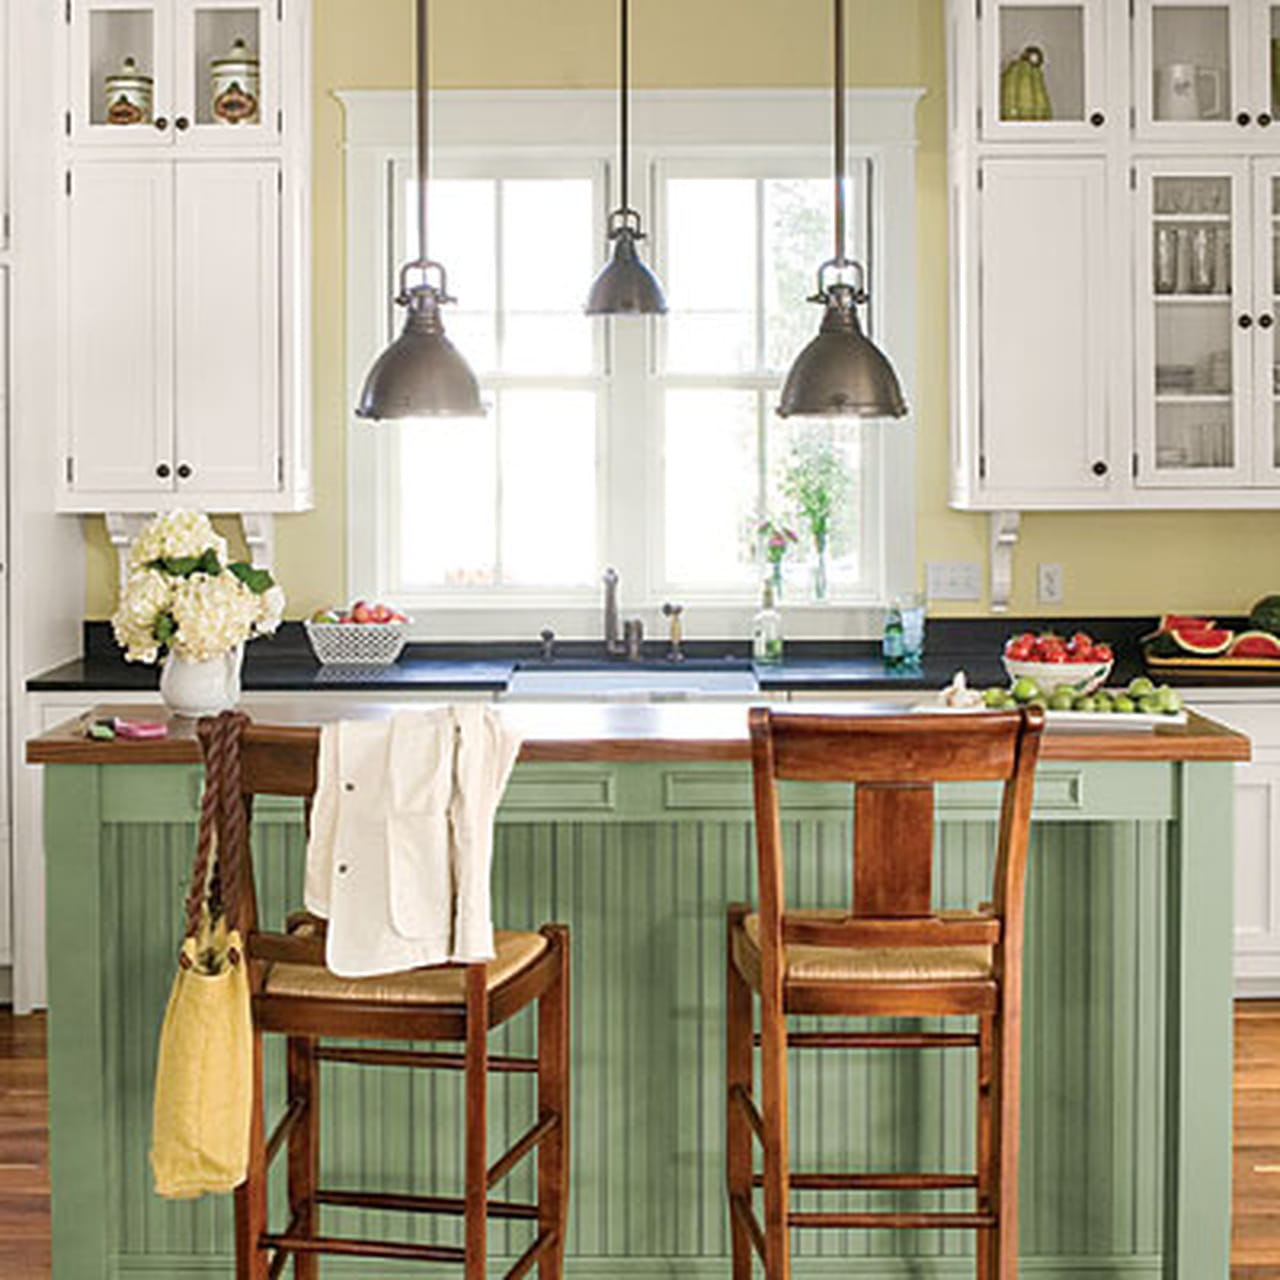 Cottage Themed Kitchen: ديكورات مطابخ شتوية 2014 .. لتتمتعي بسحر الشتاء في مطبخك